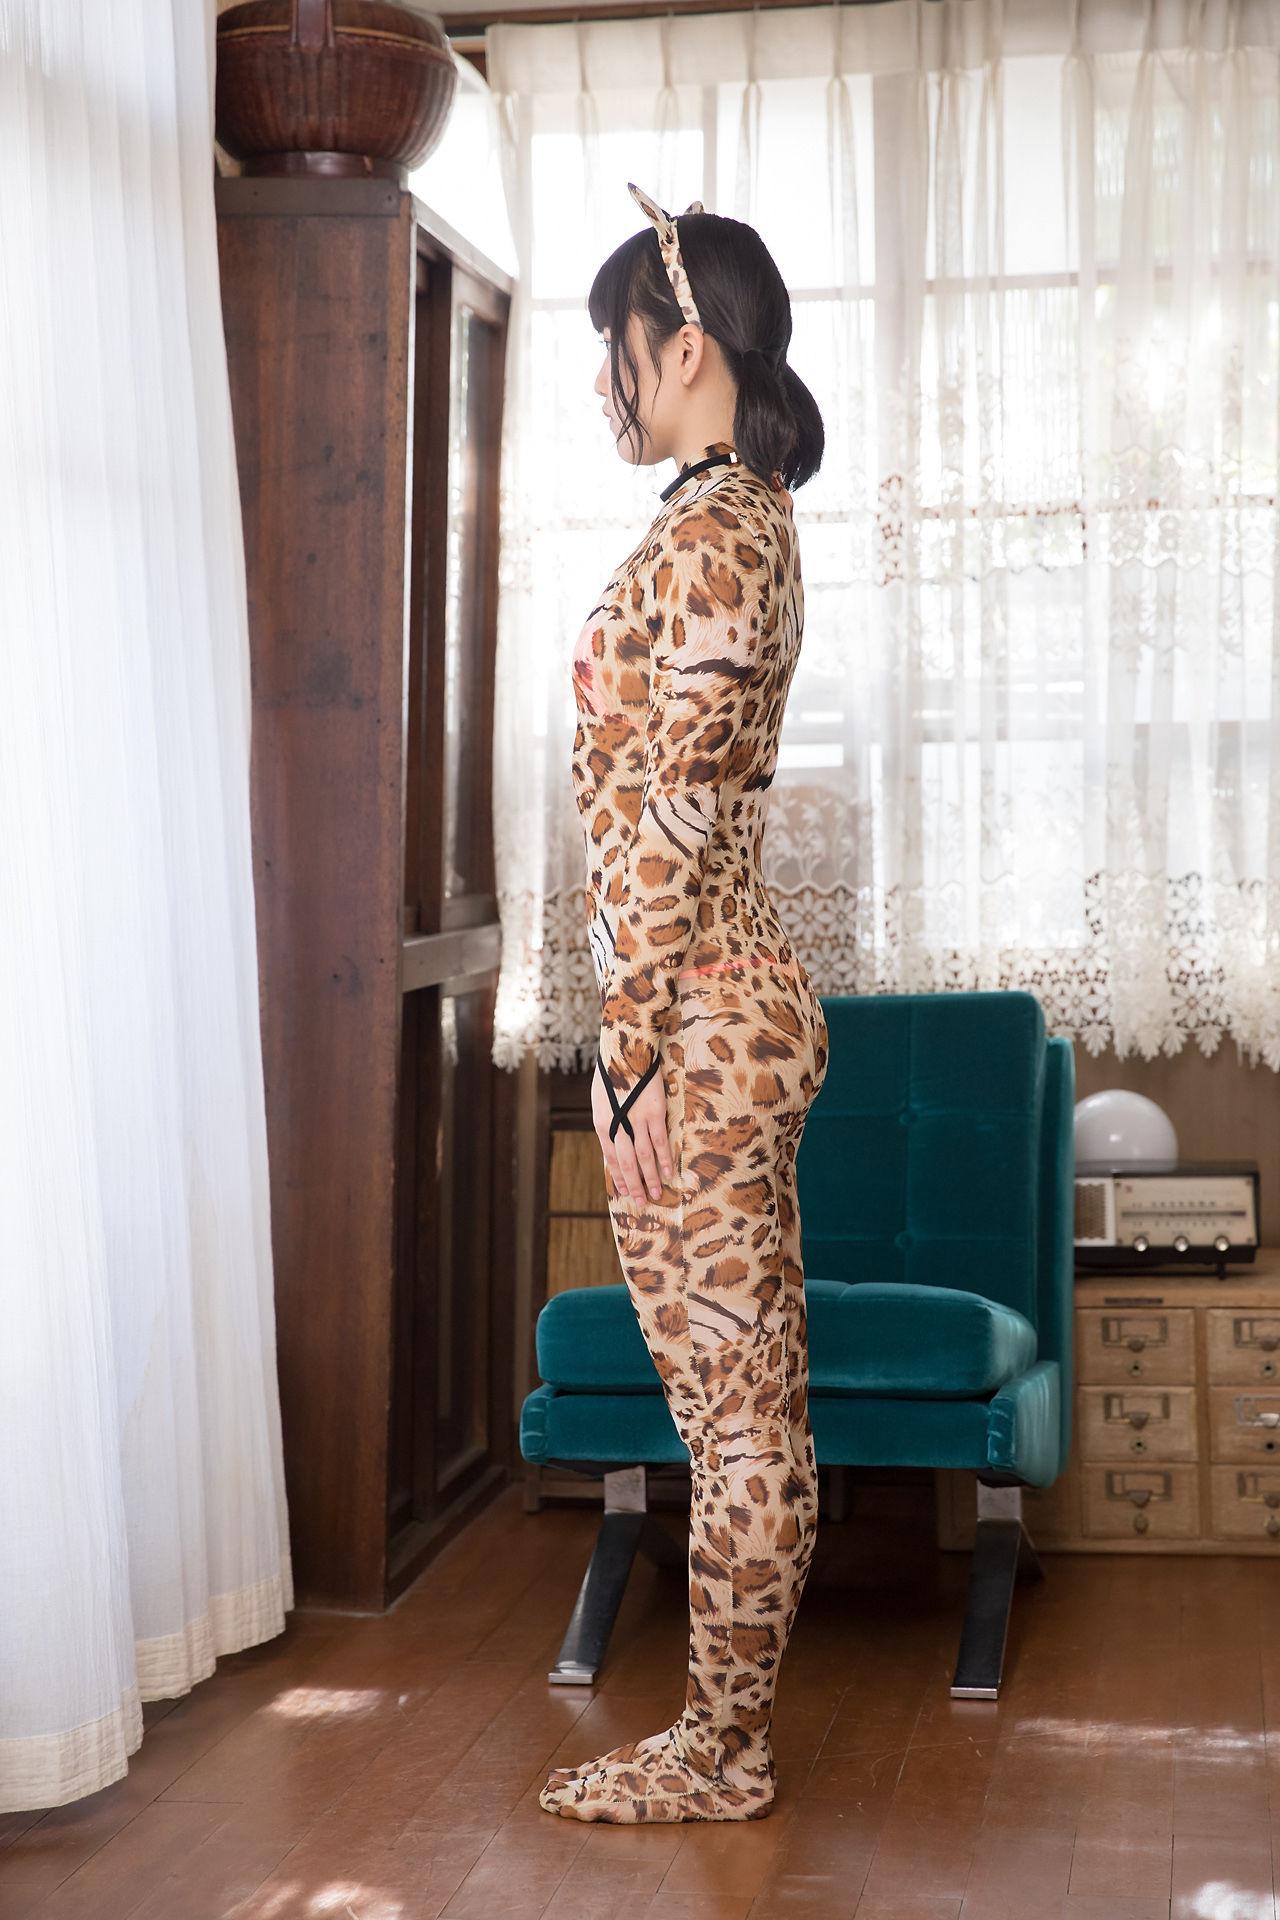 VOL.795 [Minisuka.tv]猫女郎豹纹美女:香月杏珠(香月りお)超高清写真套图(55P)